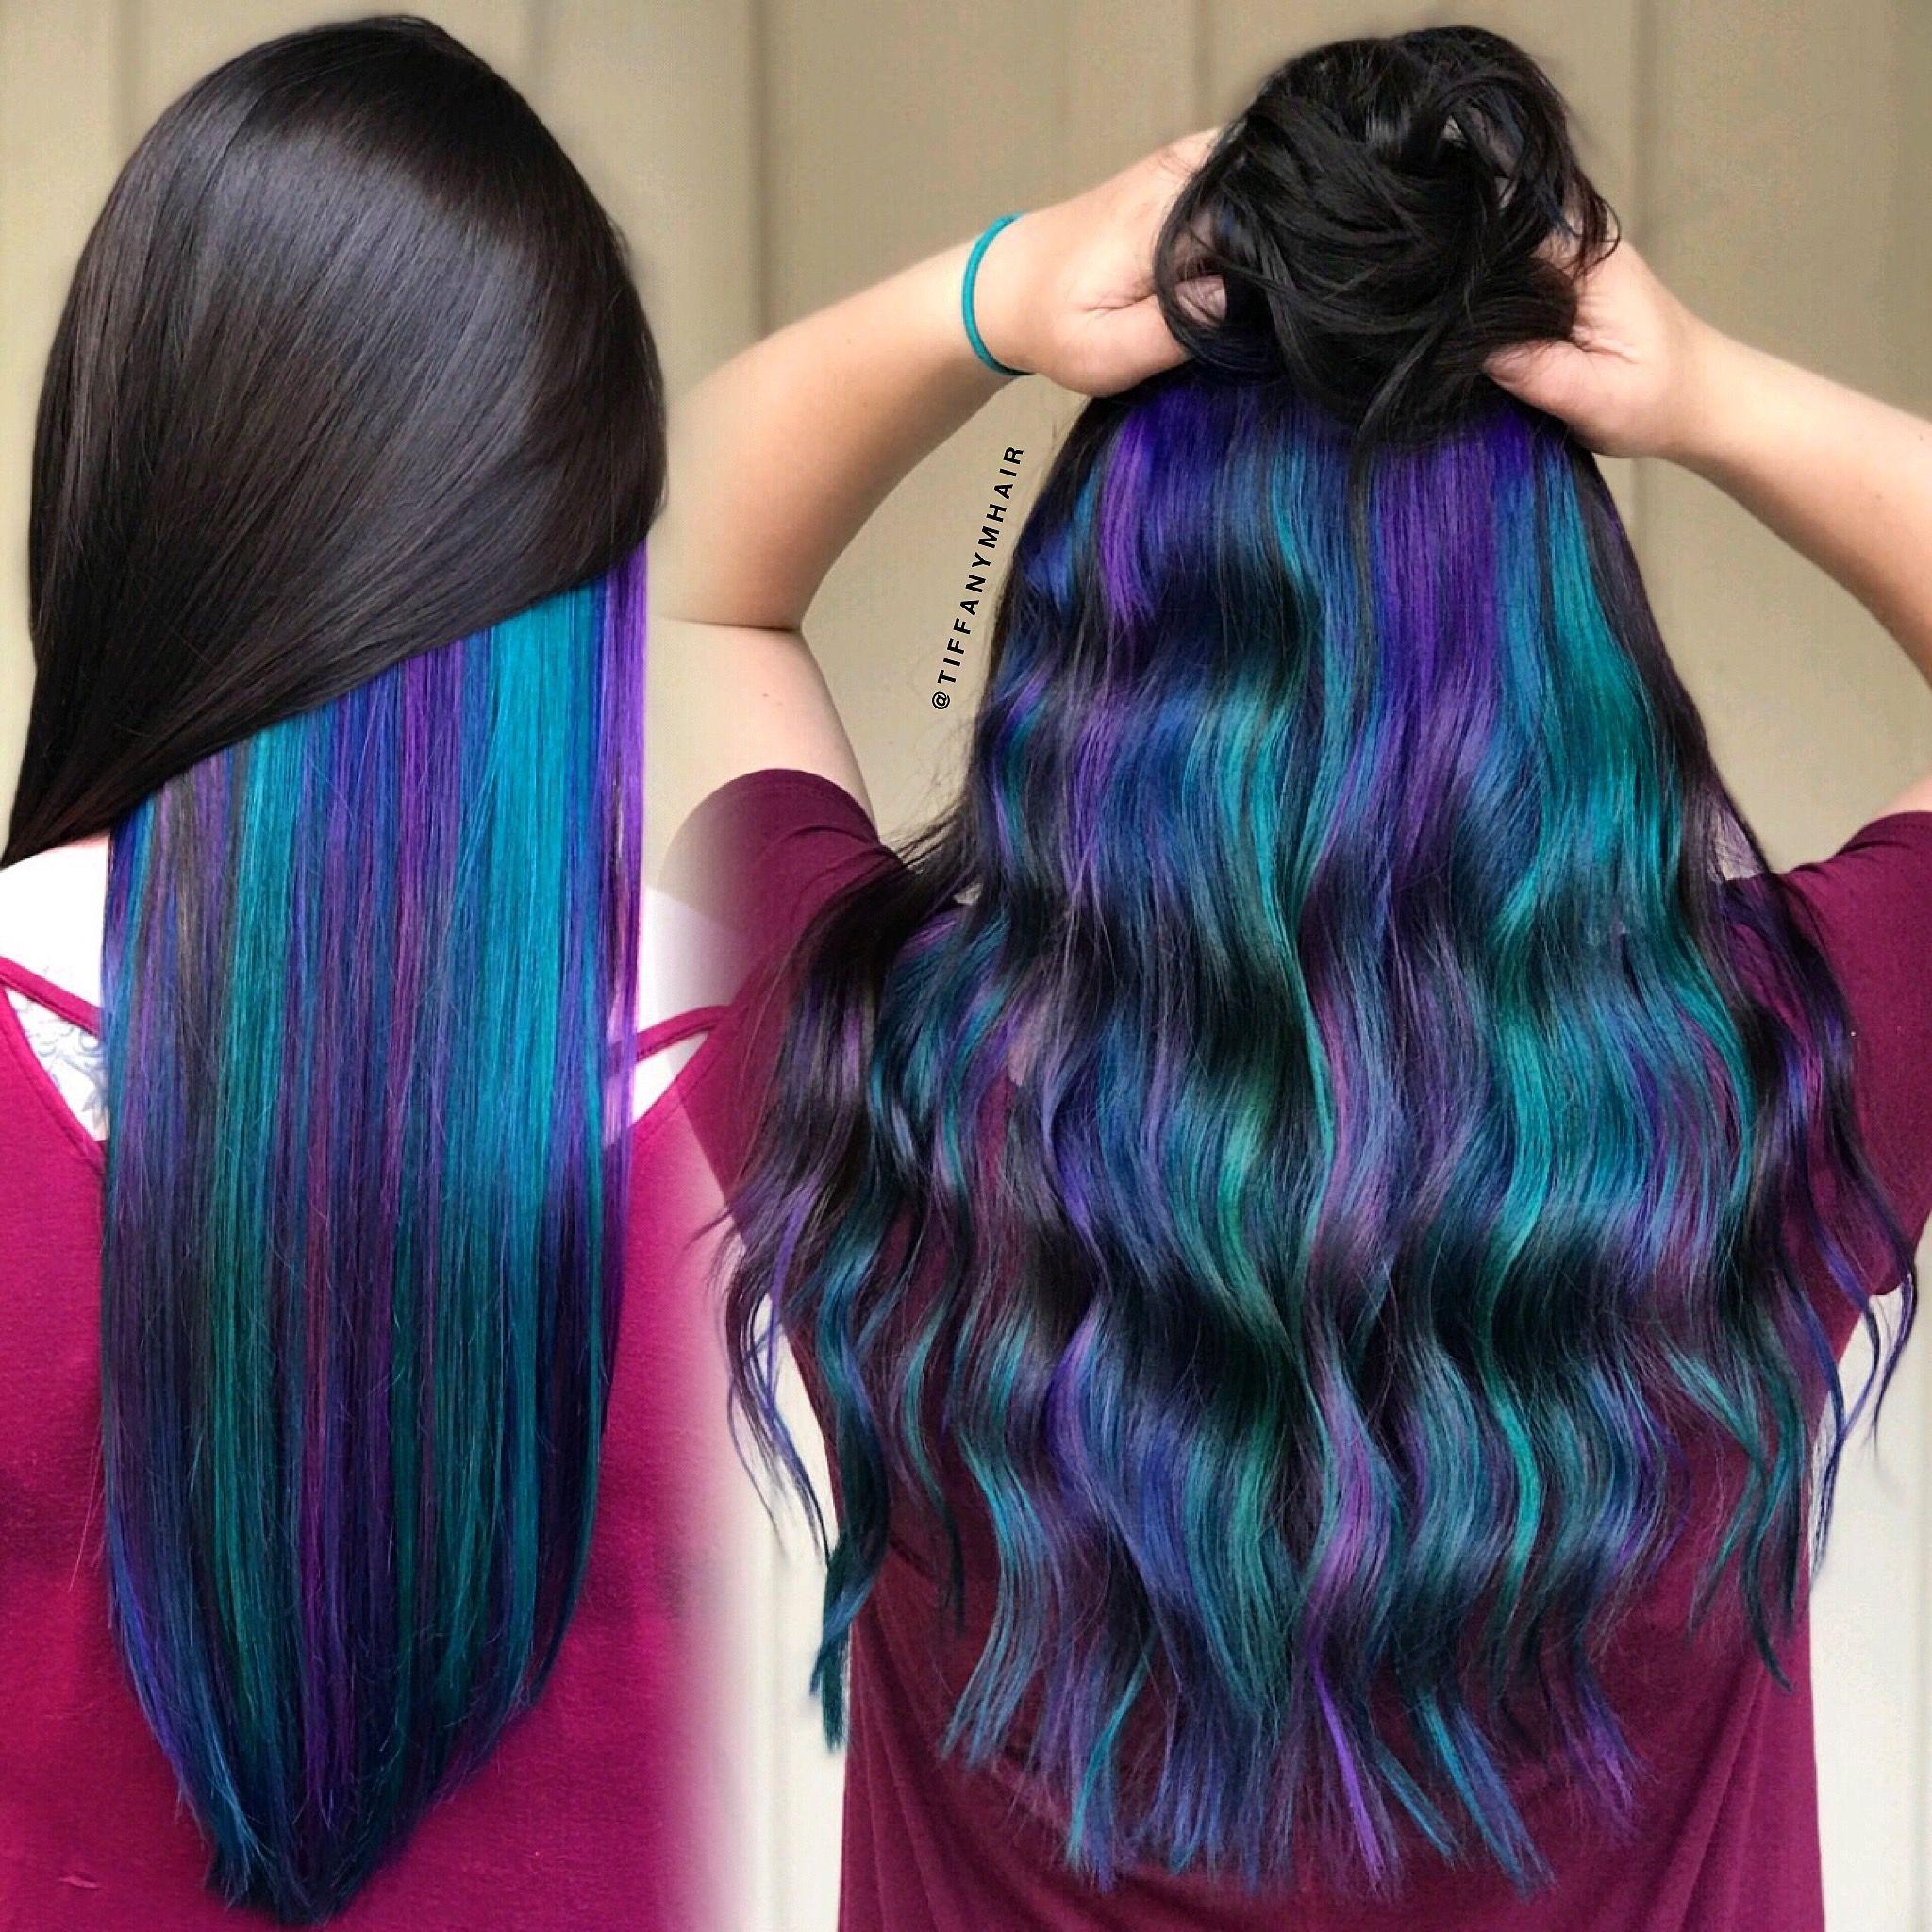 Mermaid Hair Underneath By Tiffanymhair With Pulpriot Color